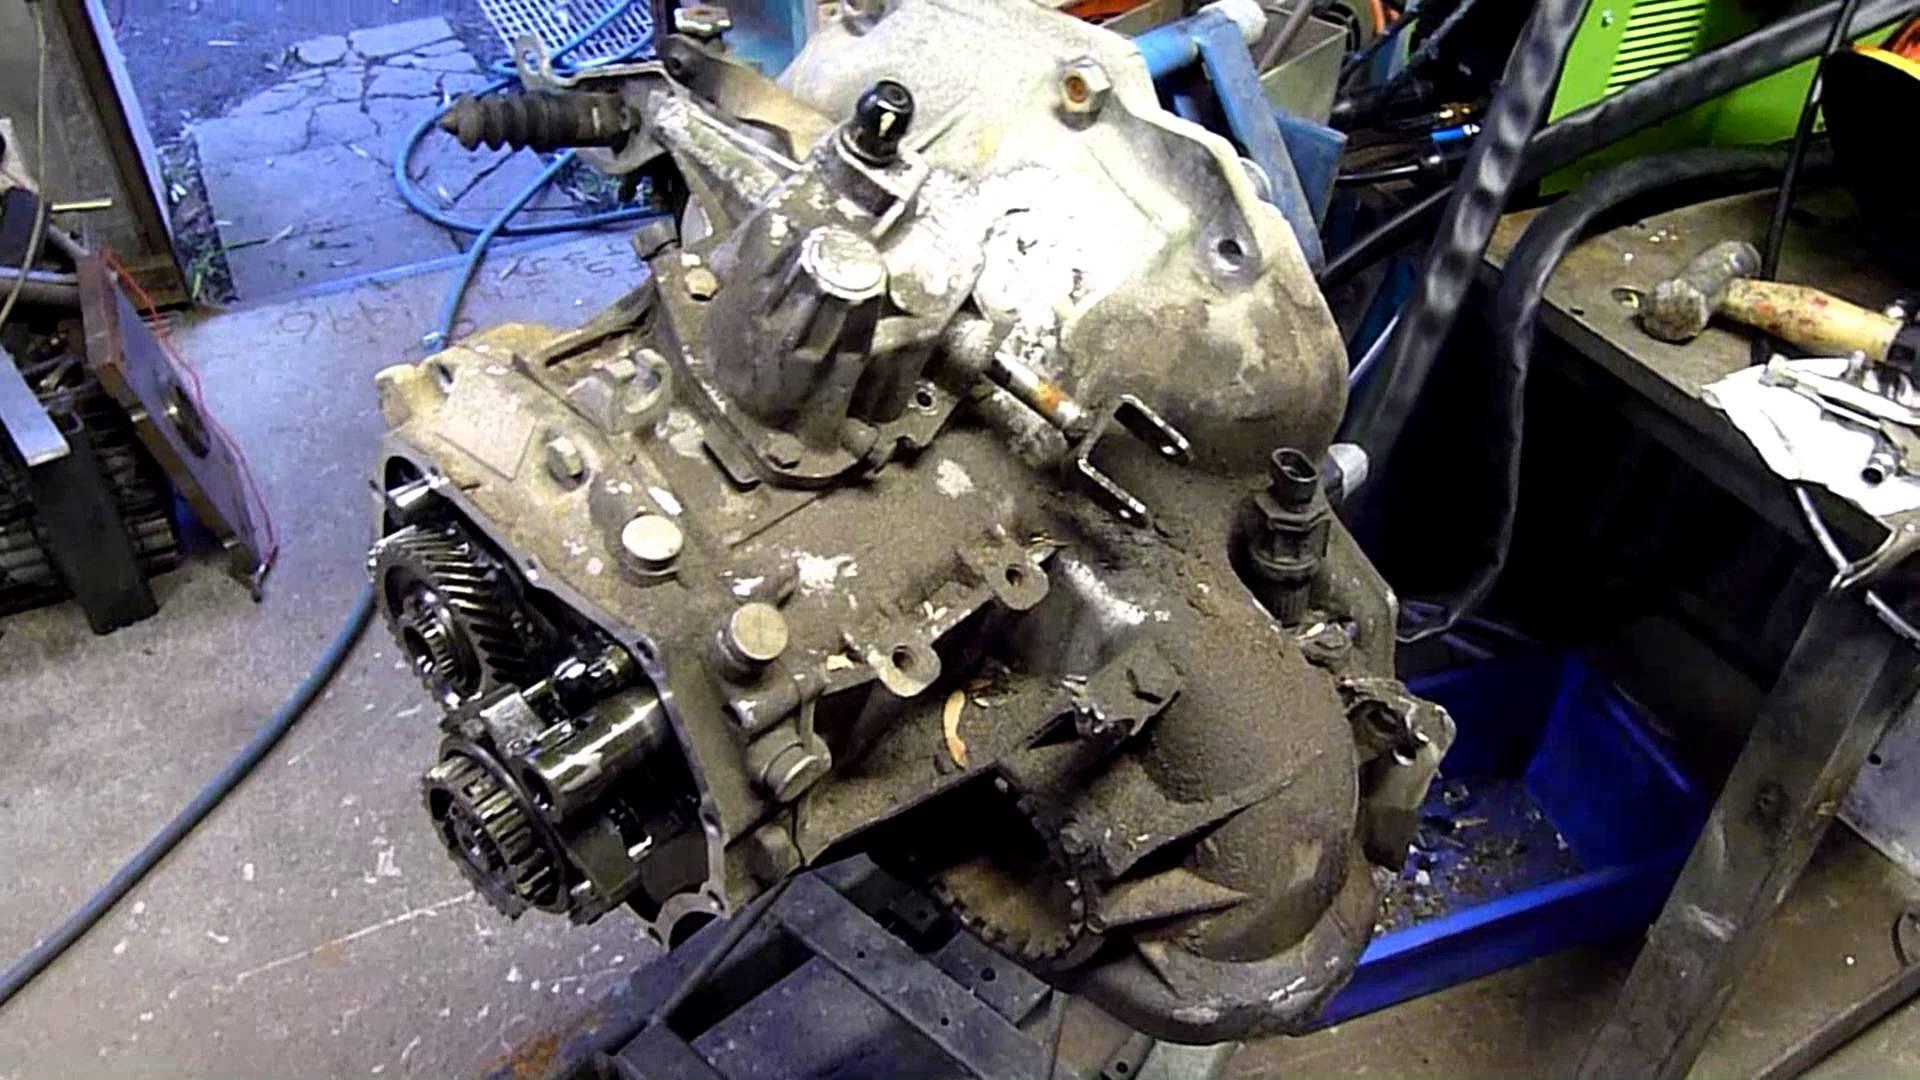 daewoo lanos engine diagram gm daewoo opel fwd 5sp manual rh detoxicrecenze com Chevy Transmission Diagram 42RE Transmission Diagram